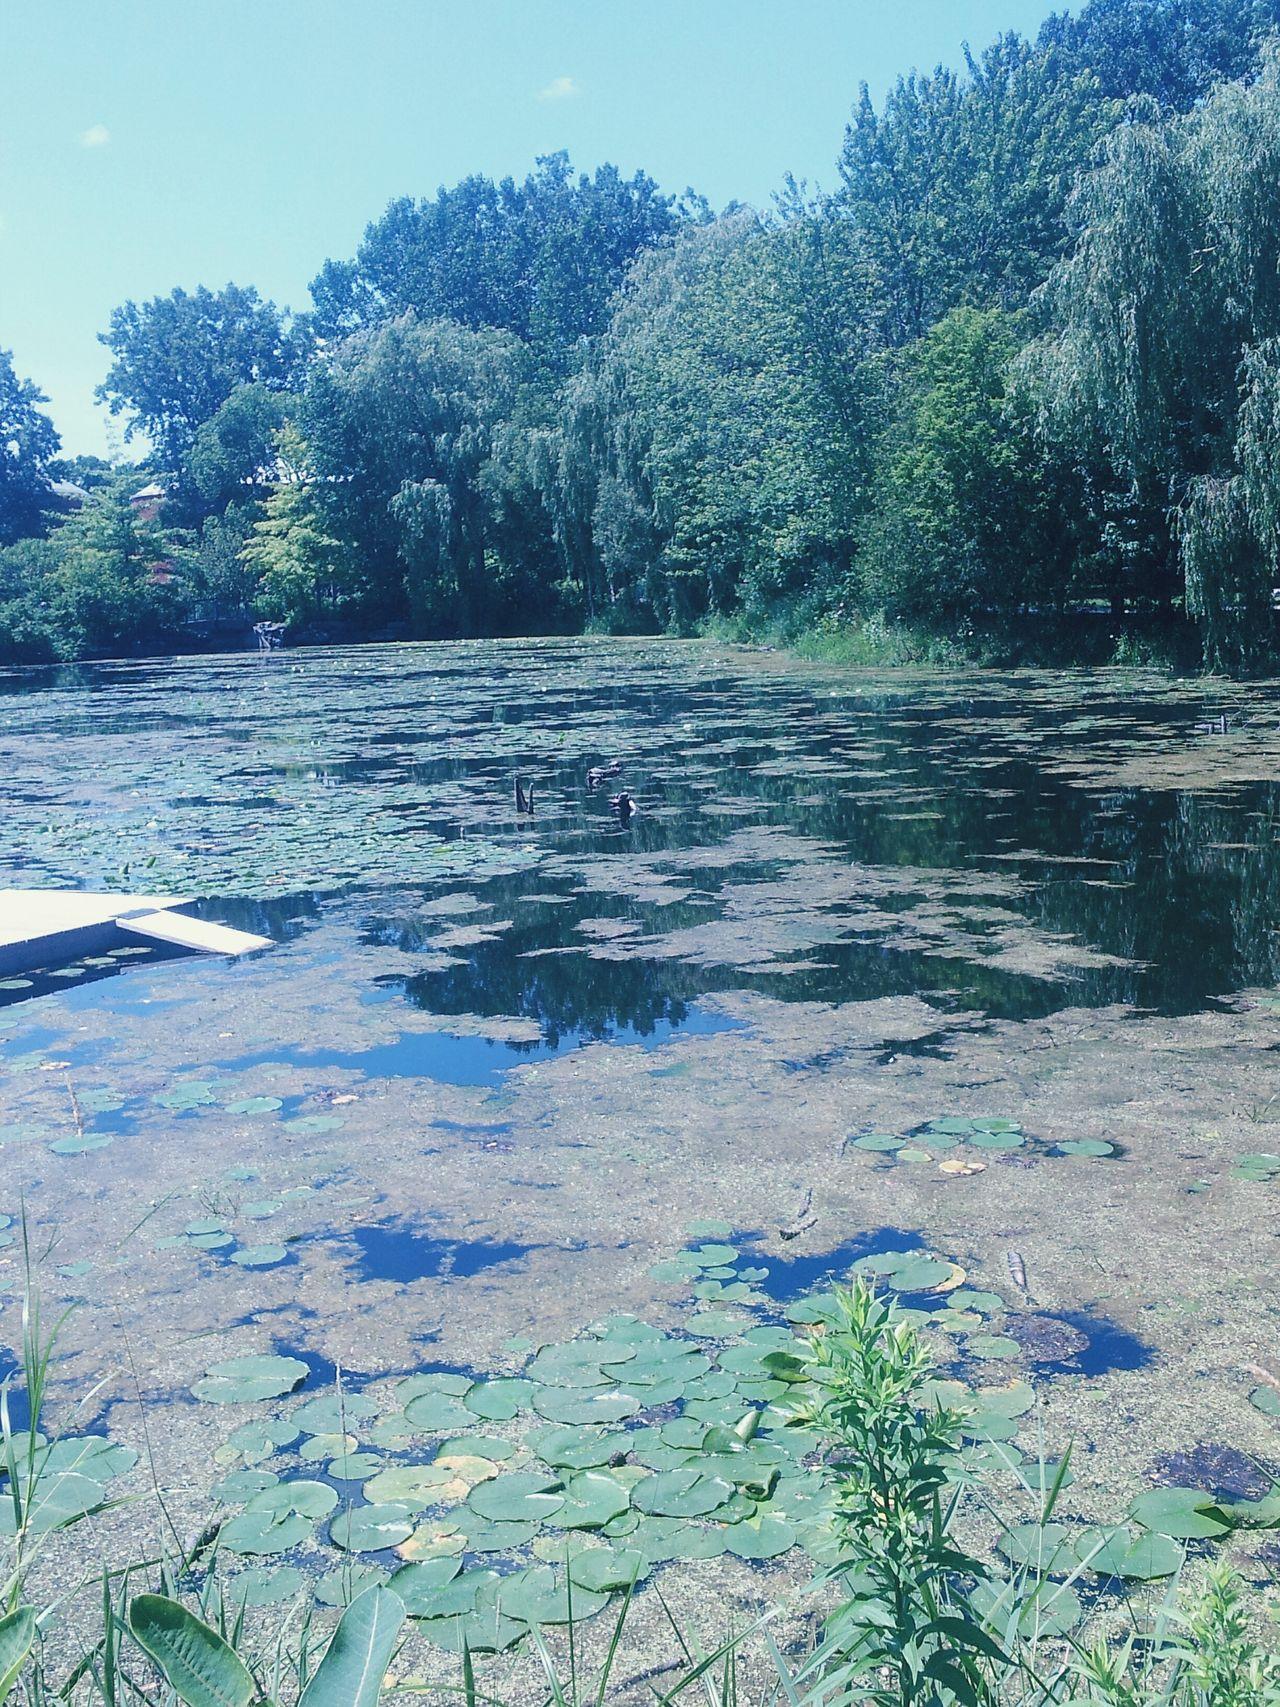 Turtle Pond Taking Photos Enjoying Life The Great Outdoors - 2017 EyeEm Awards